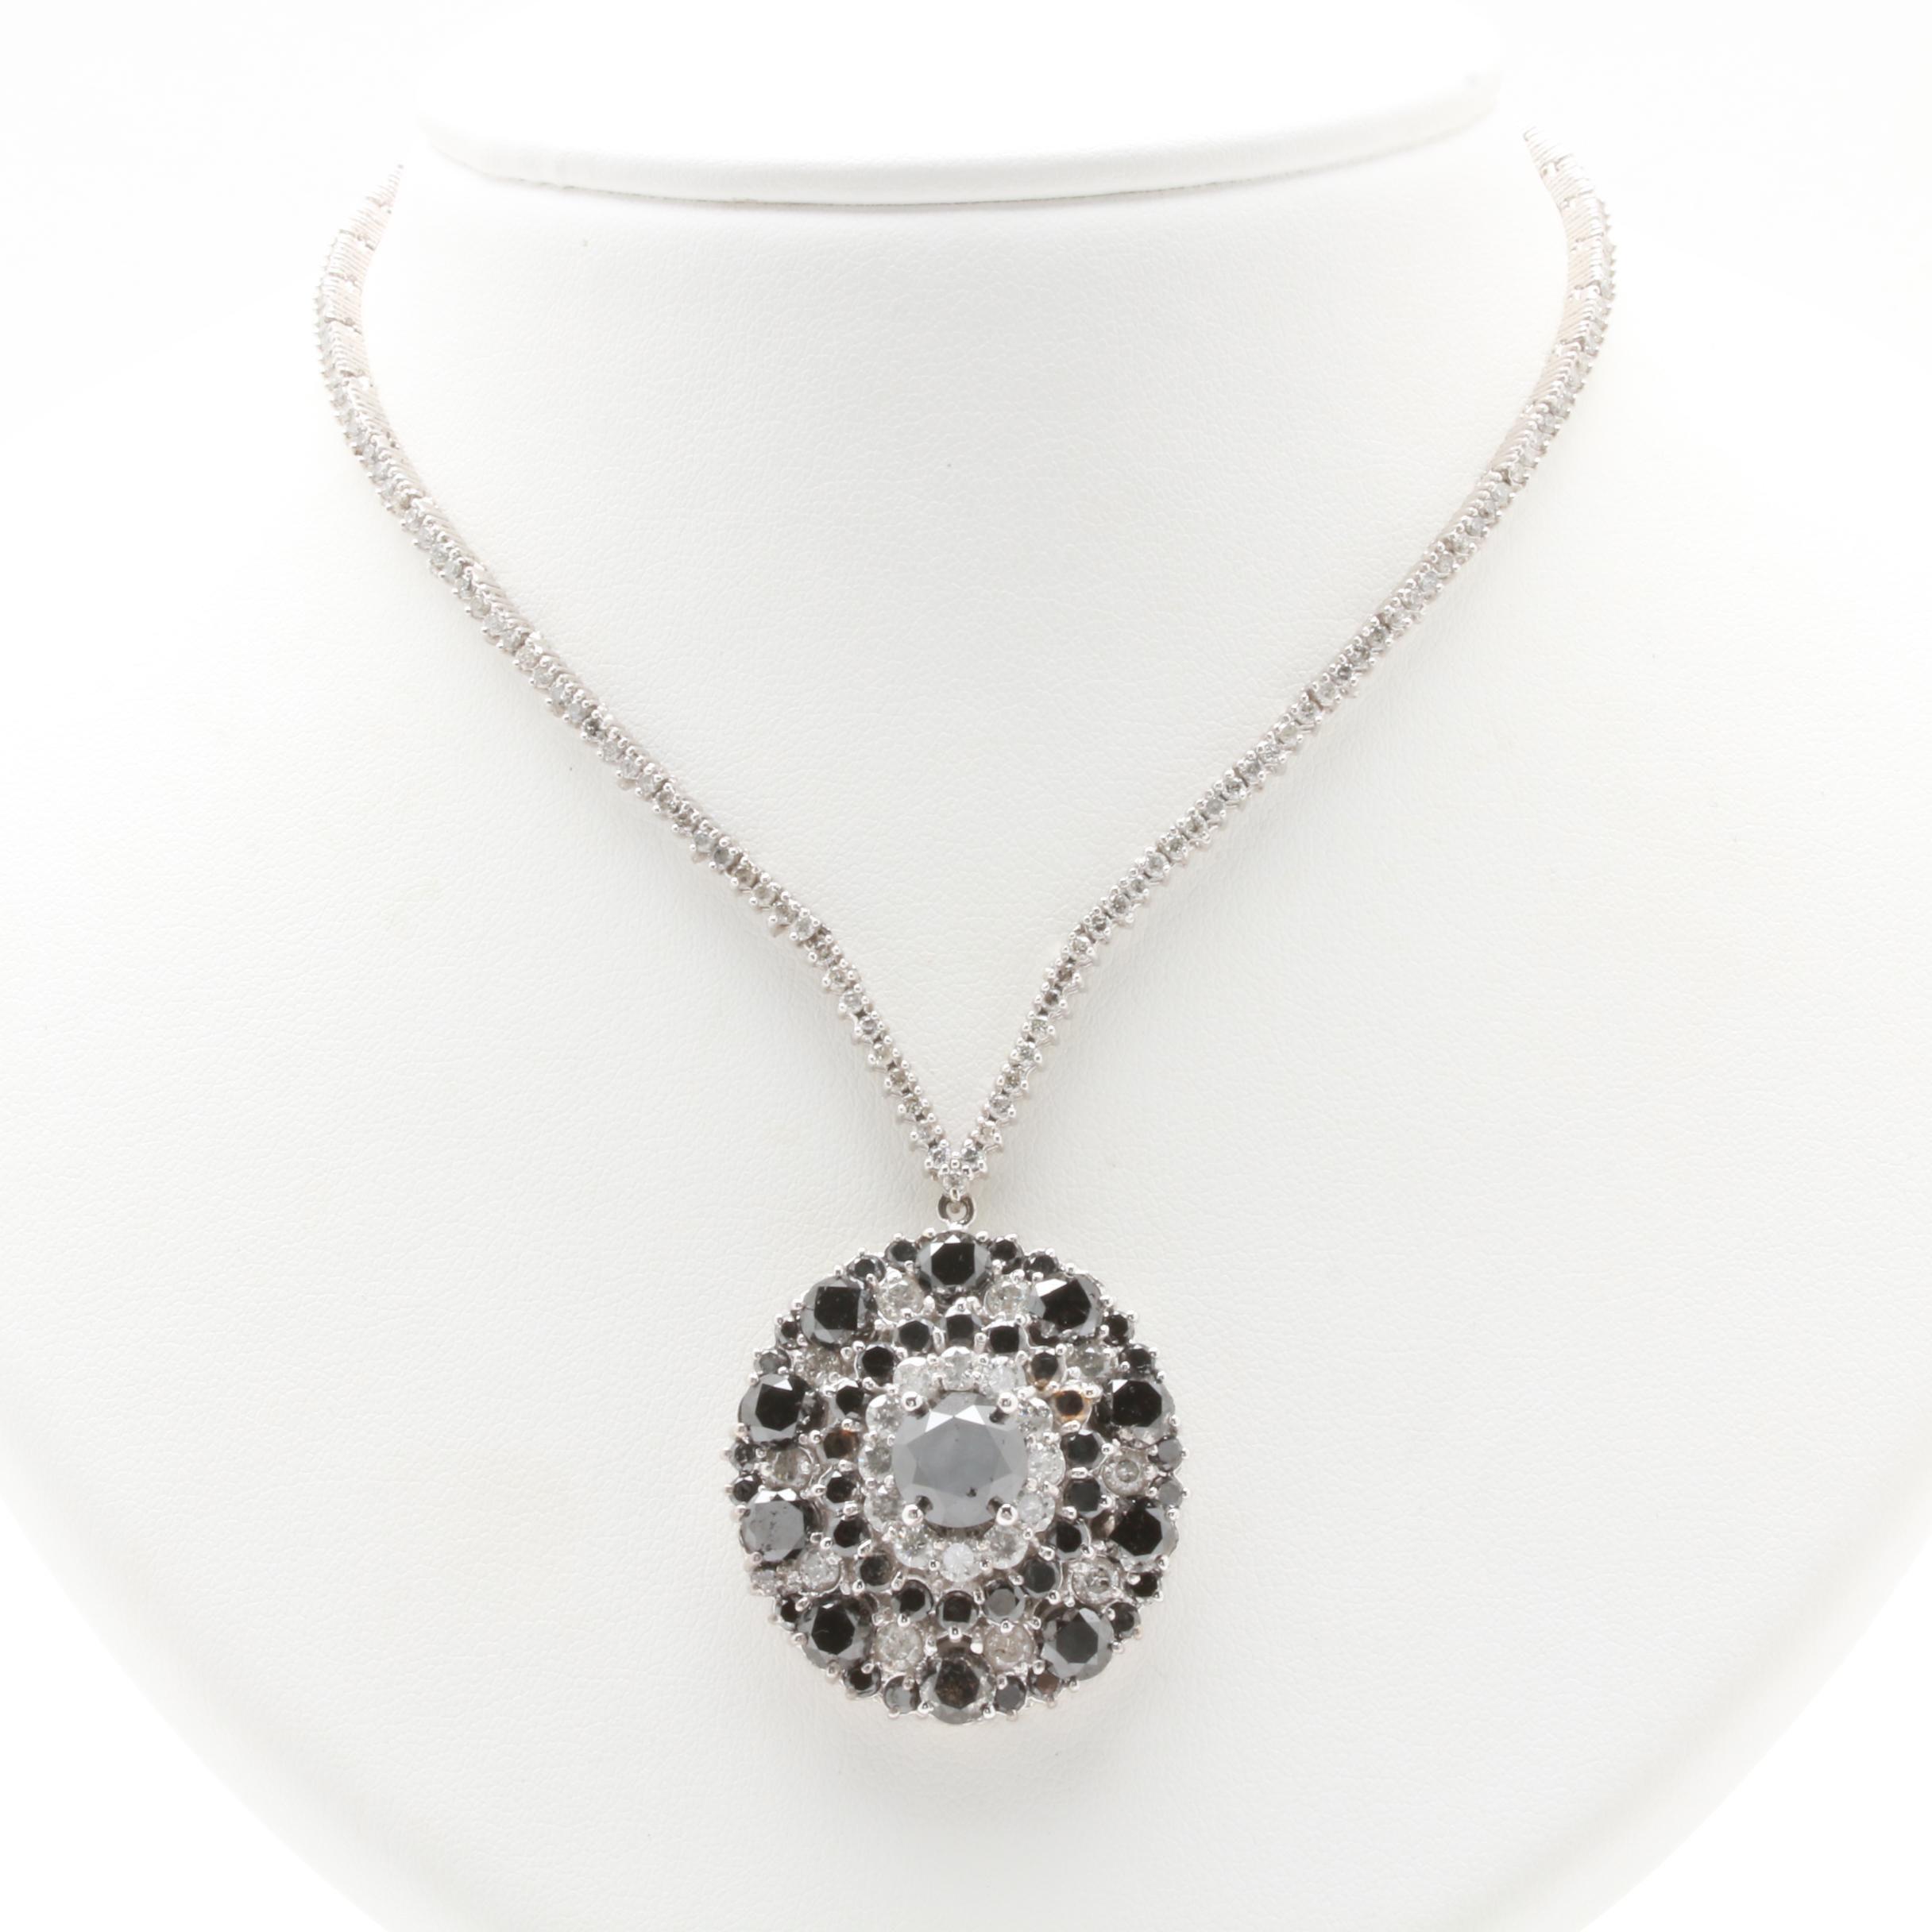 14K White Gold 16.63 CTW Diamond Pendant Necklace with Black Diamonds